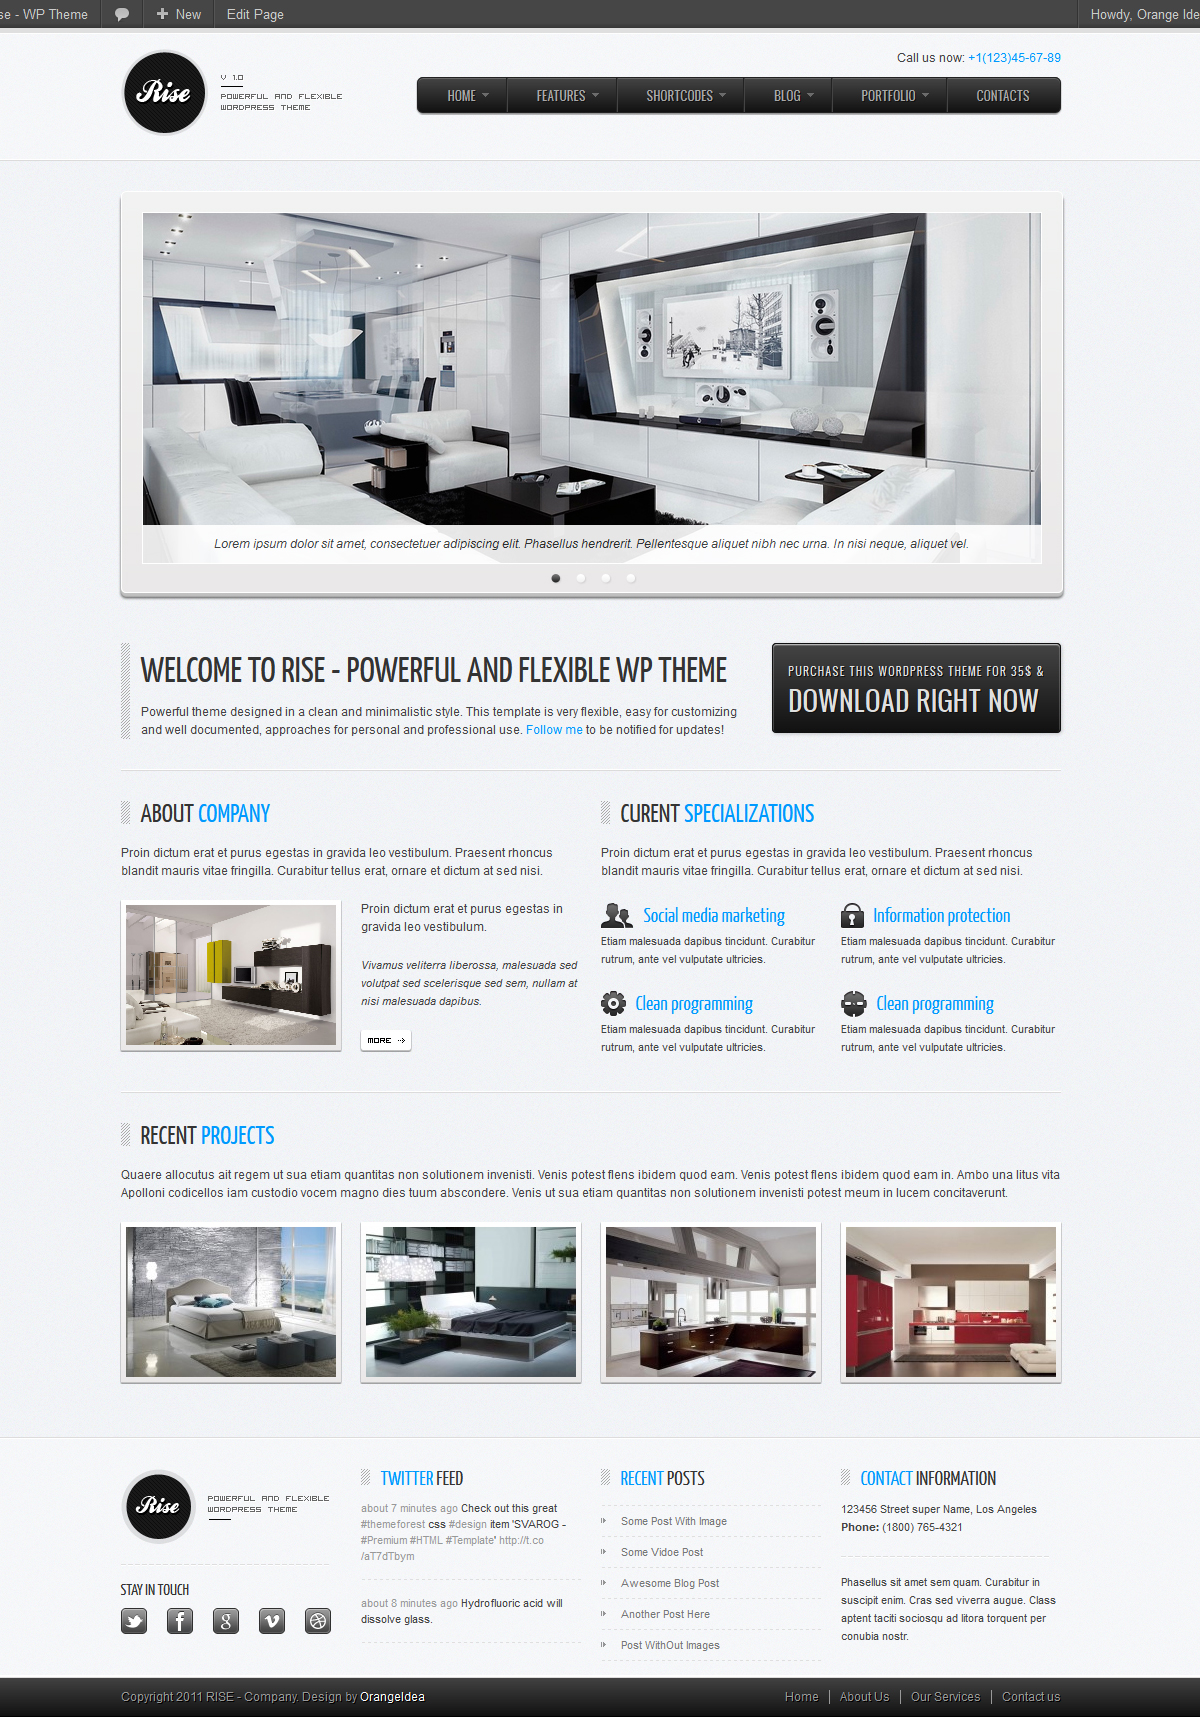 RISE - Premium WordPress Theme